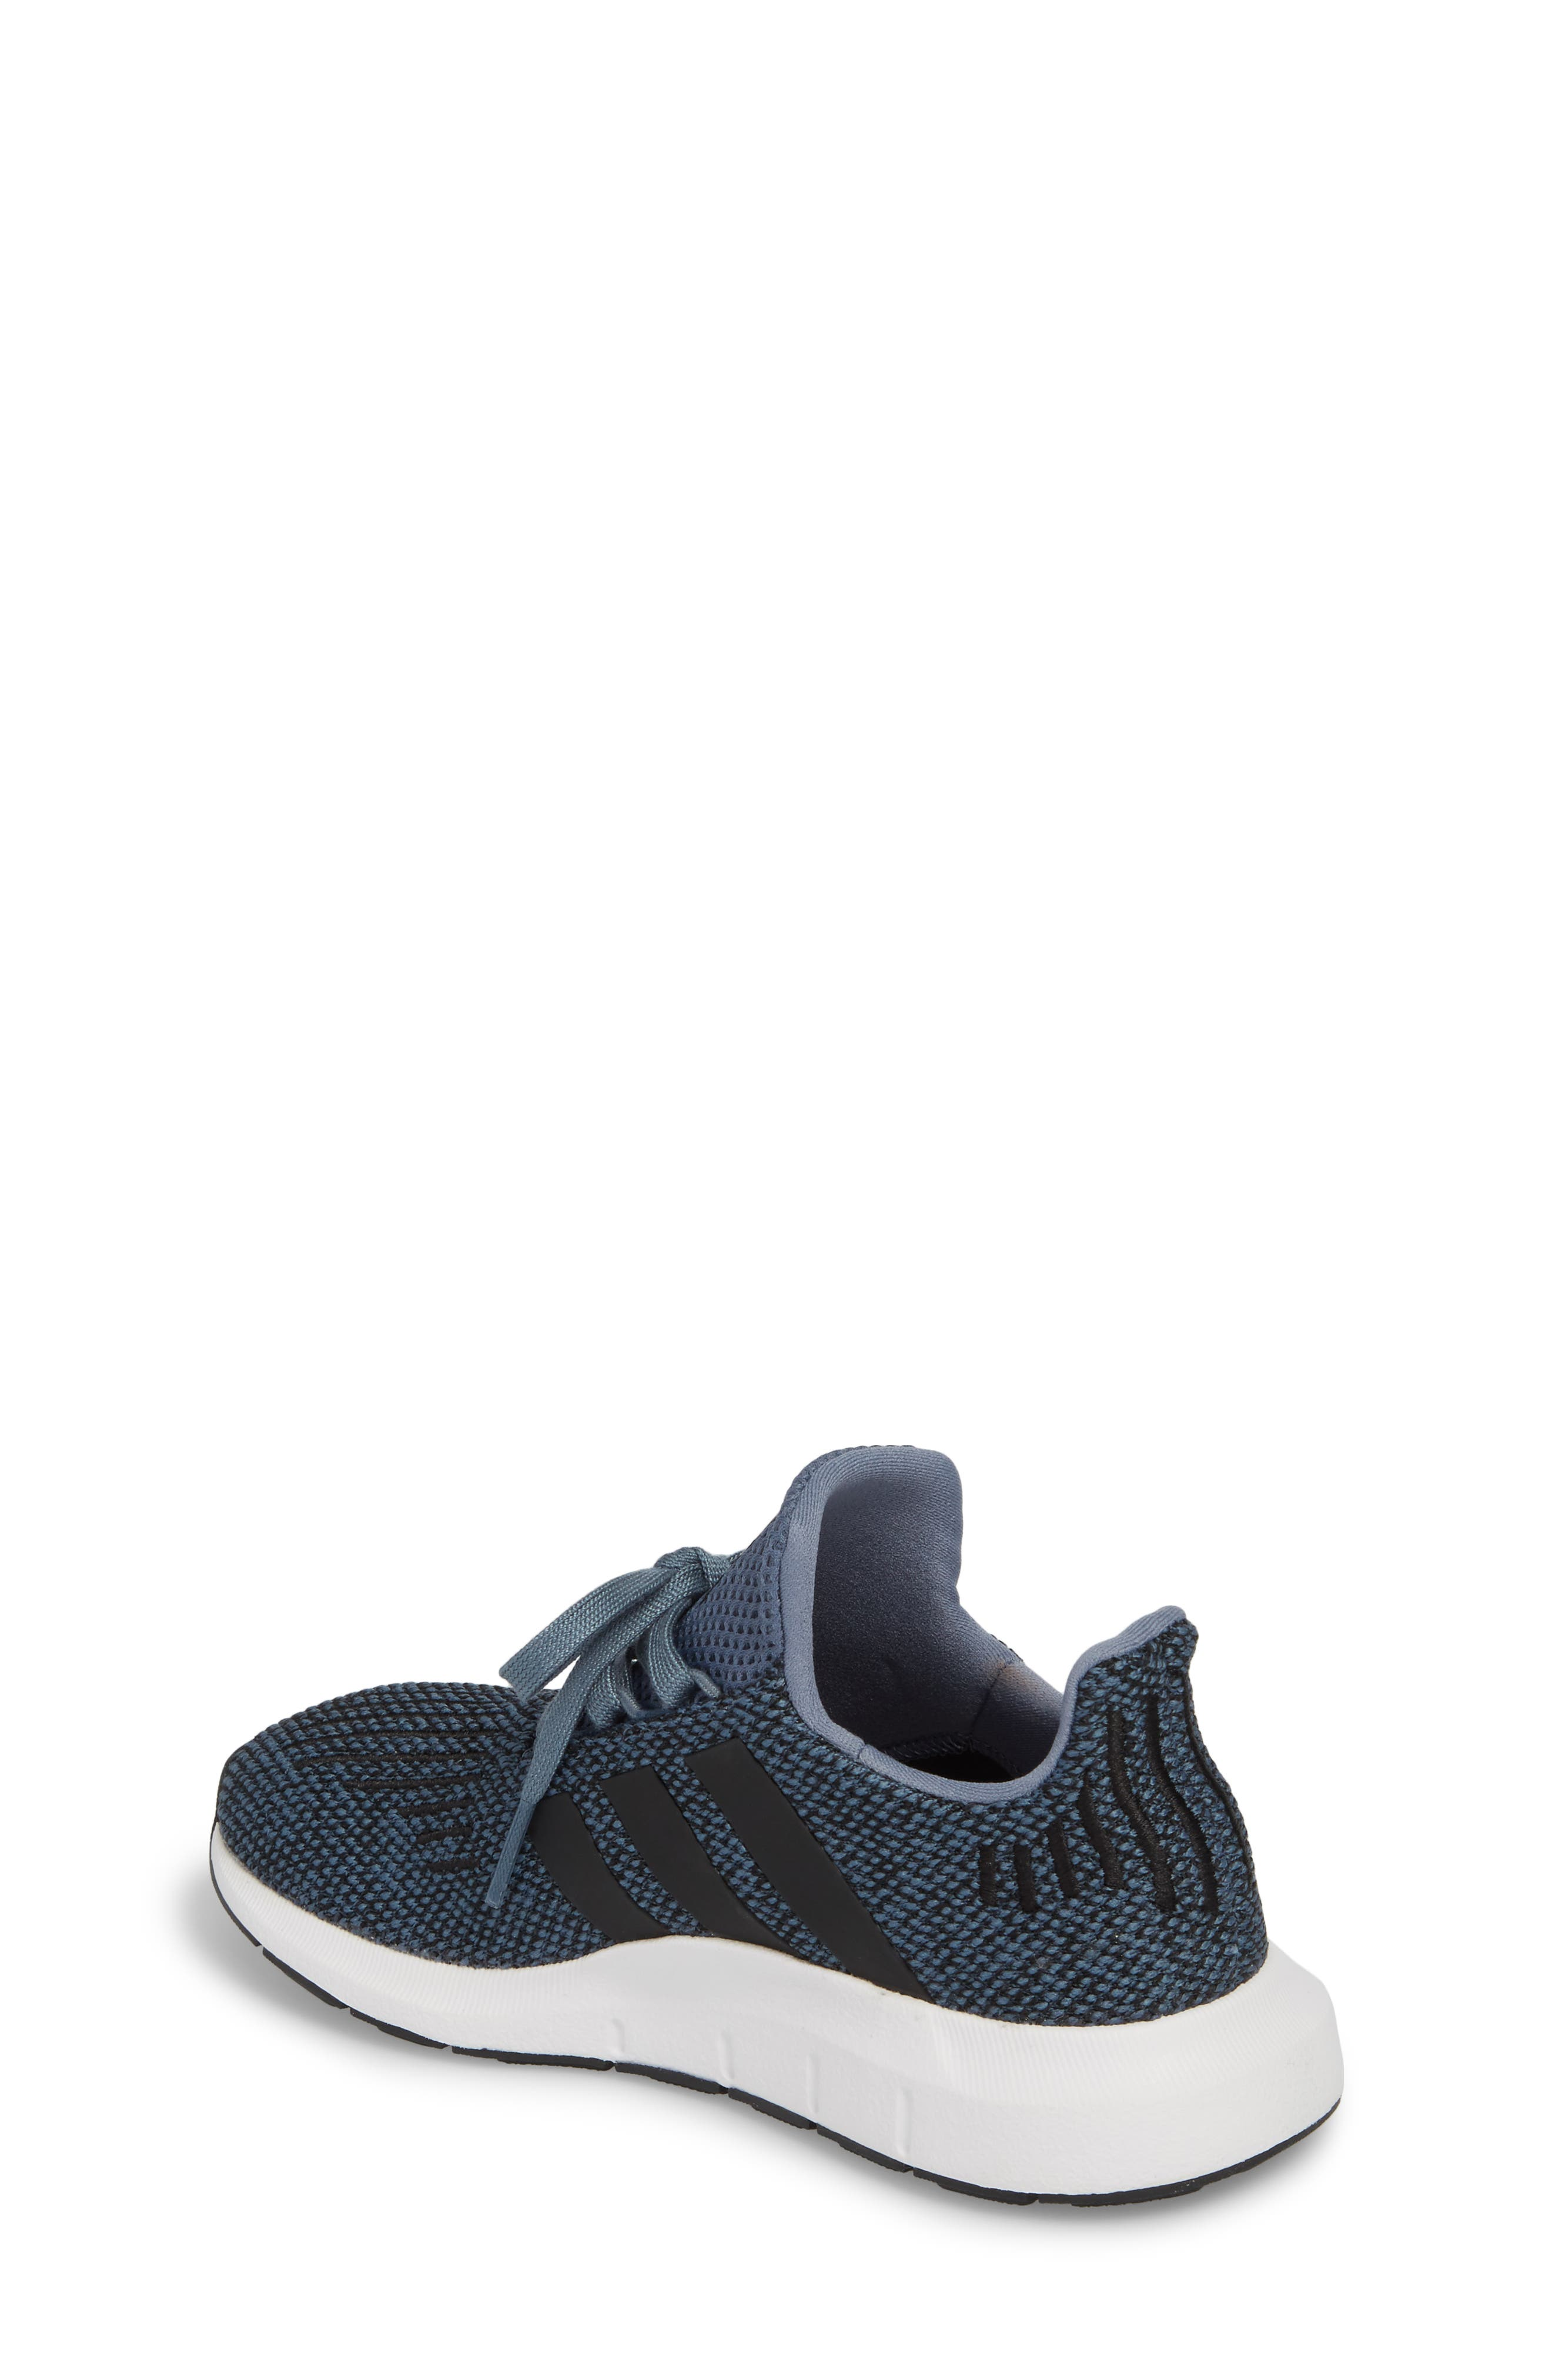 Alternate Image 2  - adidas Swift Run J Sneaker (Baby, Walker, Toddler, Little Kid & Big Kid)